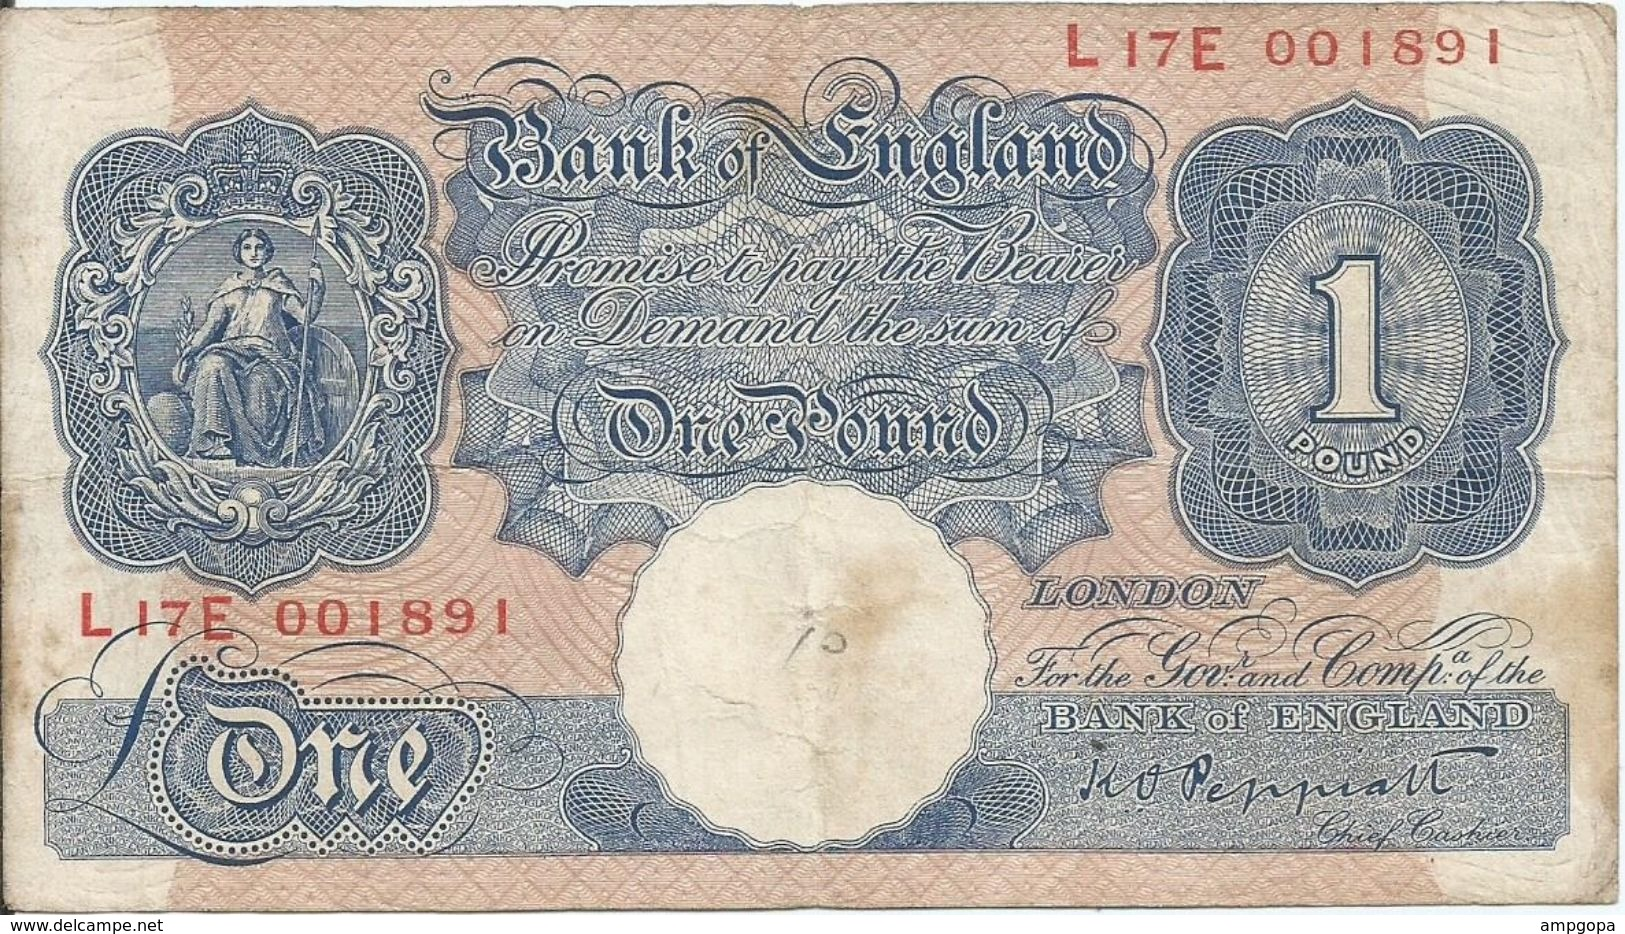 Gran Bretaña - Great Britain 1 Pound 1940 Pk 367 A Firma Peppiatt Ref 891-2 - 1 Pound